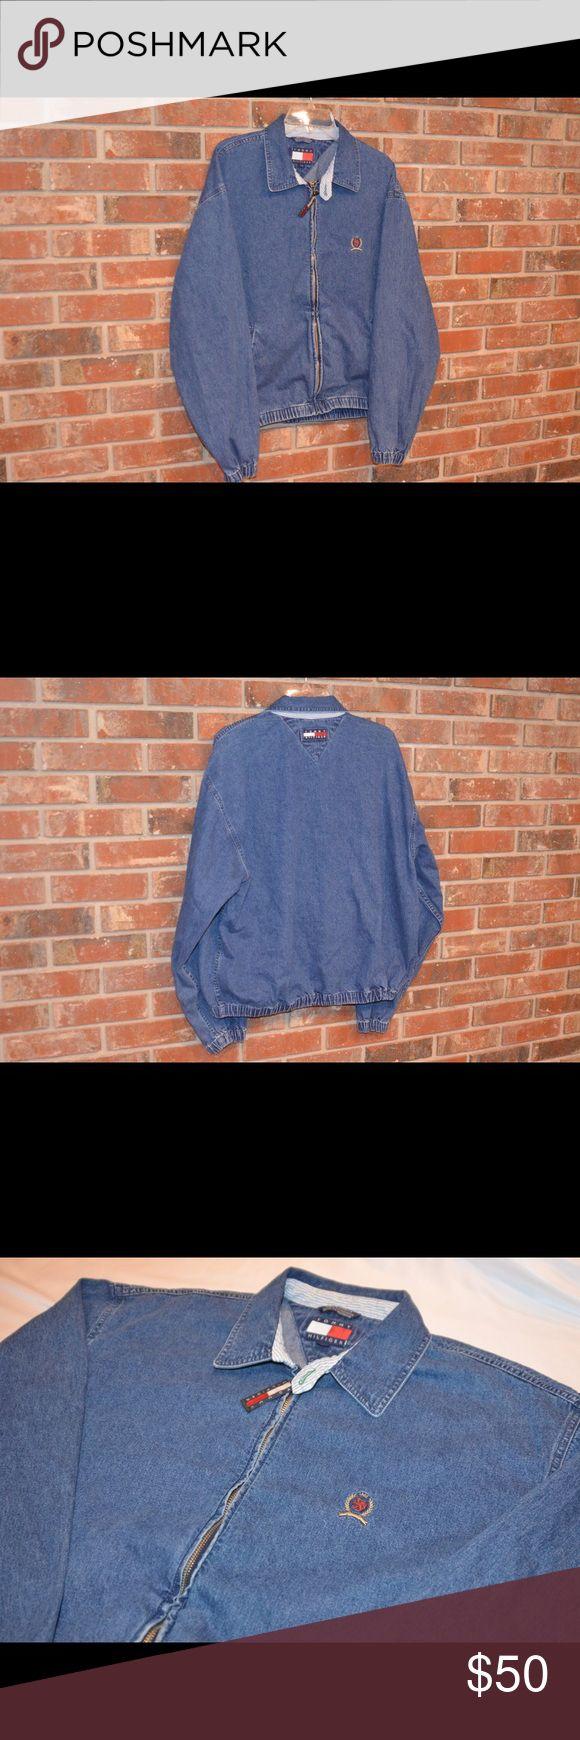 "Vintage Tommy Hilfiger Full Zip Denim Jacket Size: L Condition: 9/10 (excellent). No visible flaws. Measurements: 26"" (top to bottom) x 25.5"" (pit to pit) Tommy Hilfiger Jackets & Coats Bomber & Varsity"